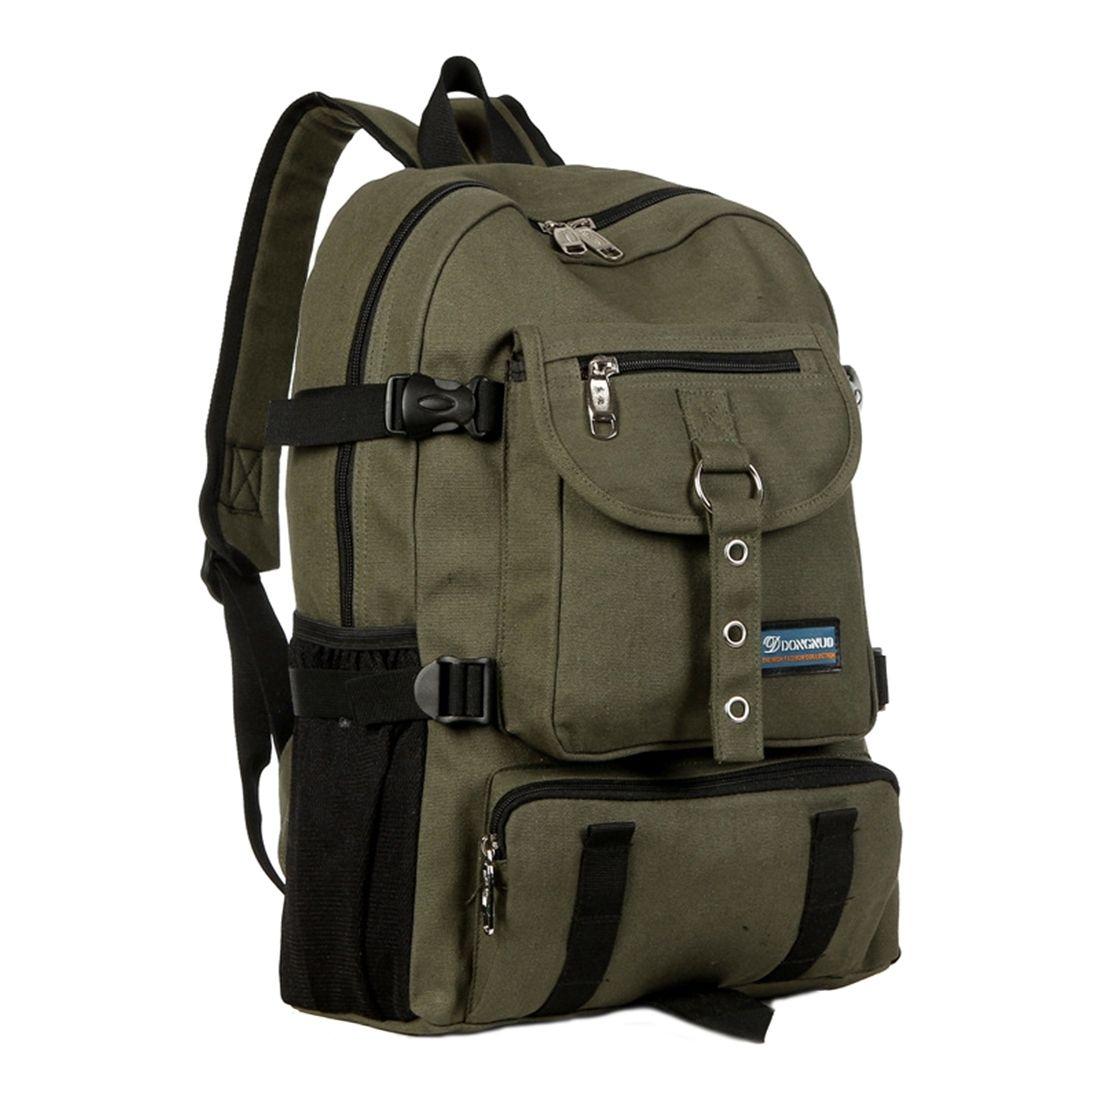 Arcuate Shoulder Strap Zipper Casual Bag Backpack School Bag Canvas Clasp Mountaineering Shoulder Bag Casual